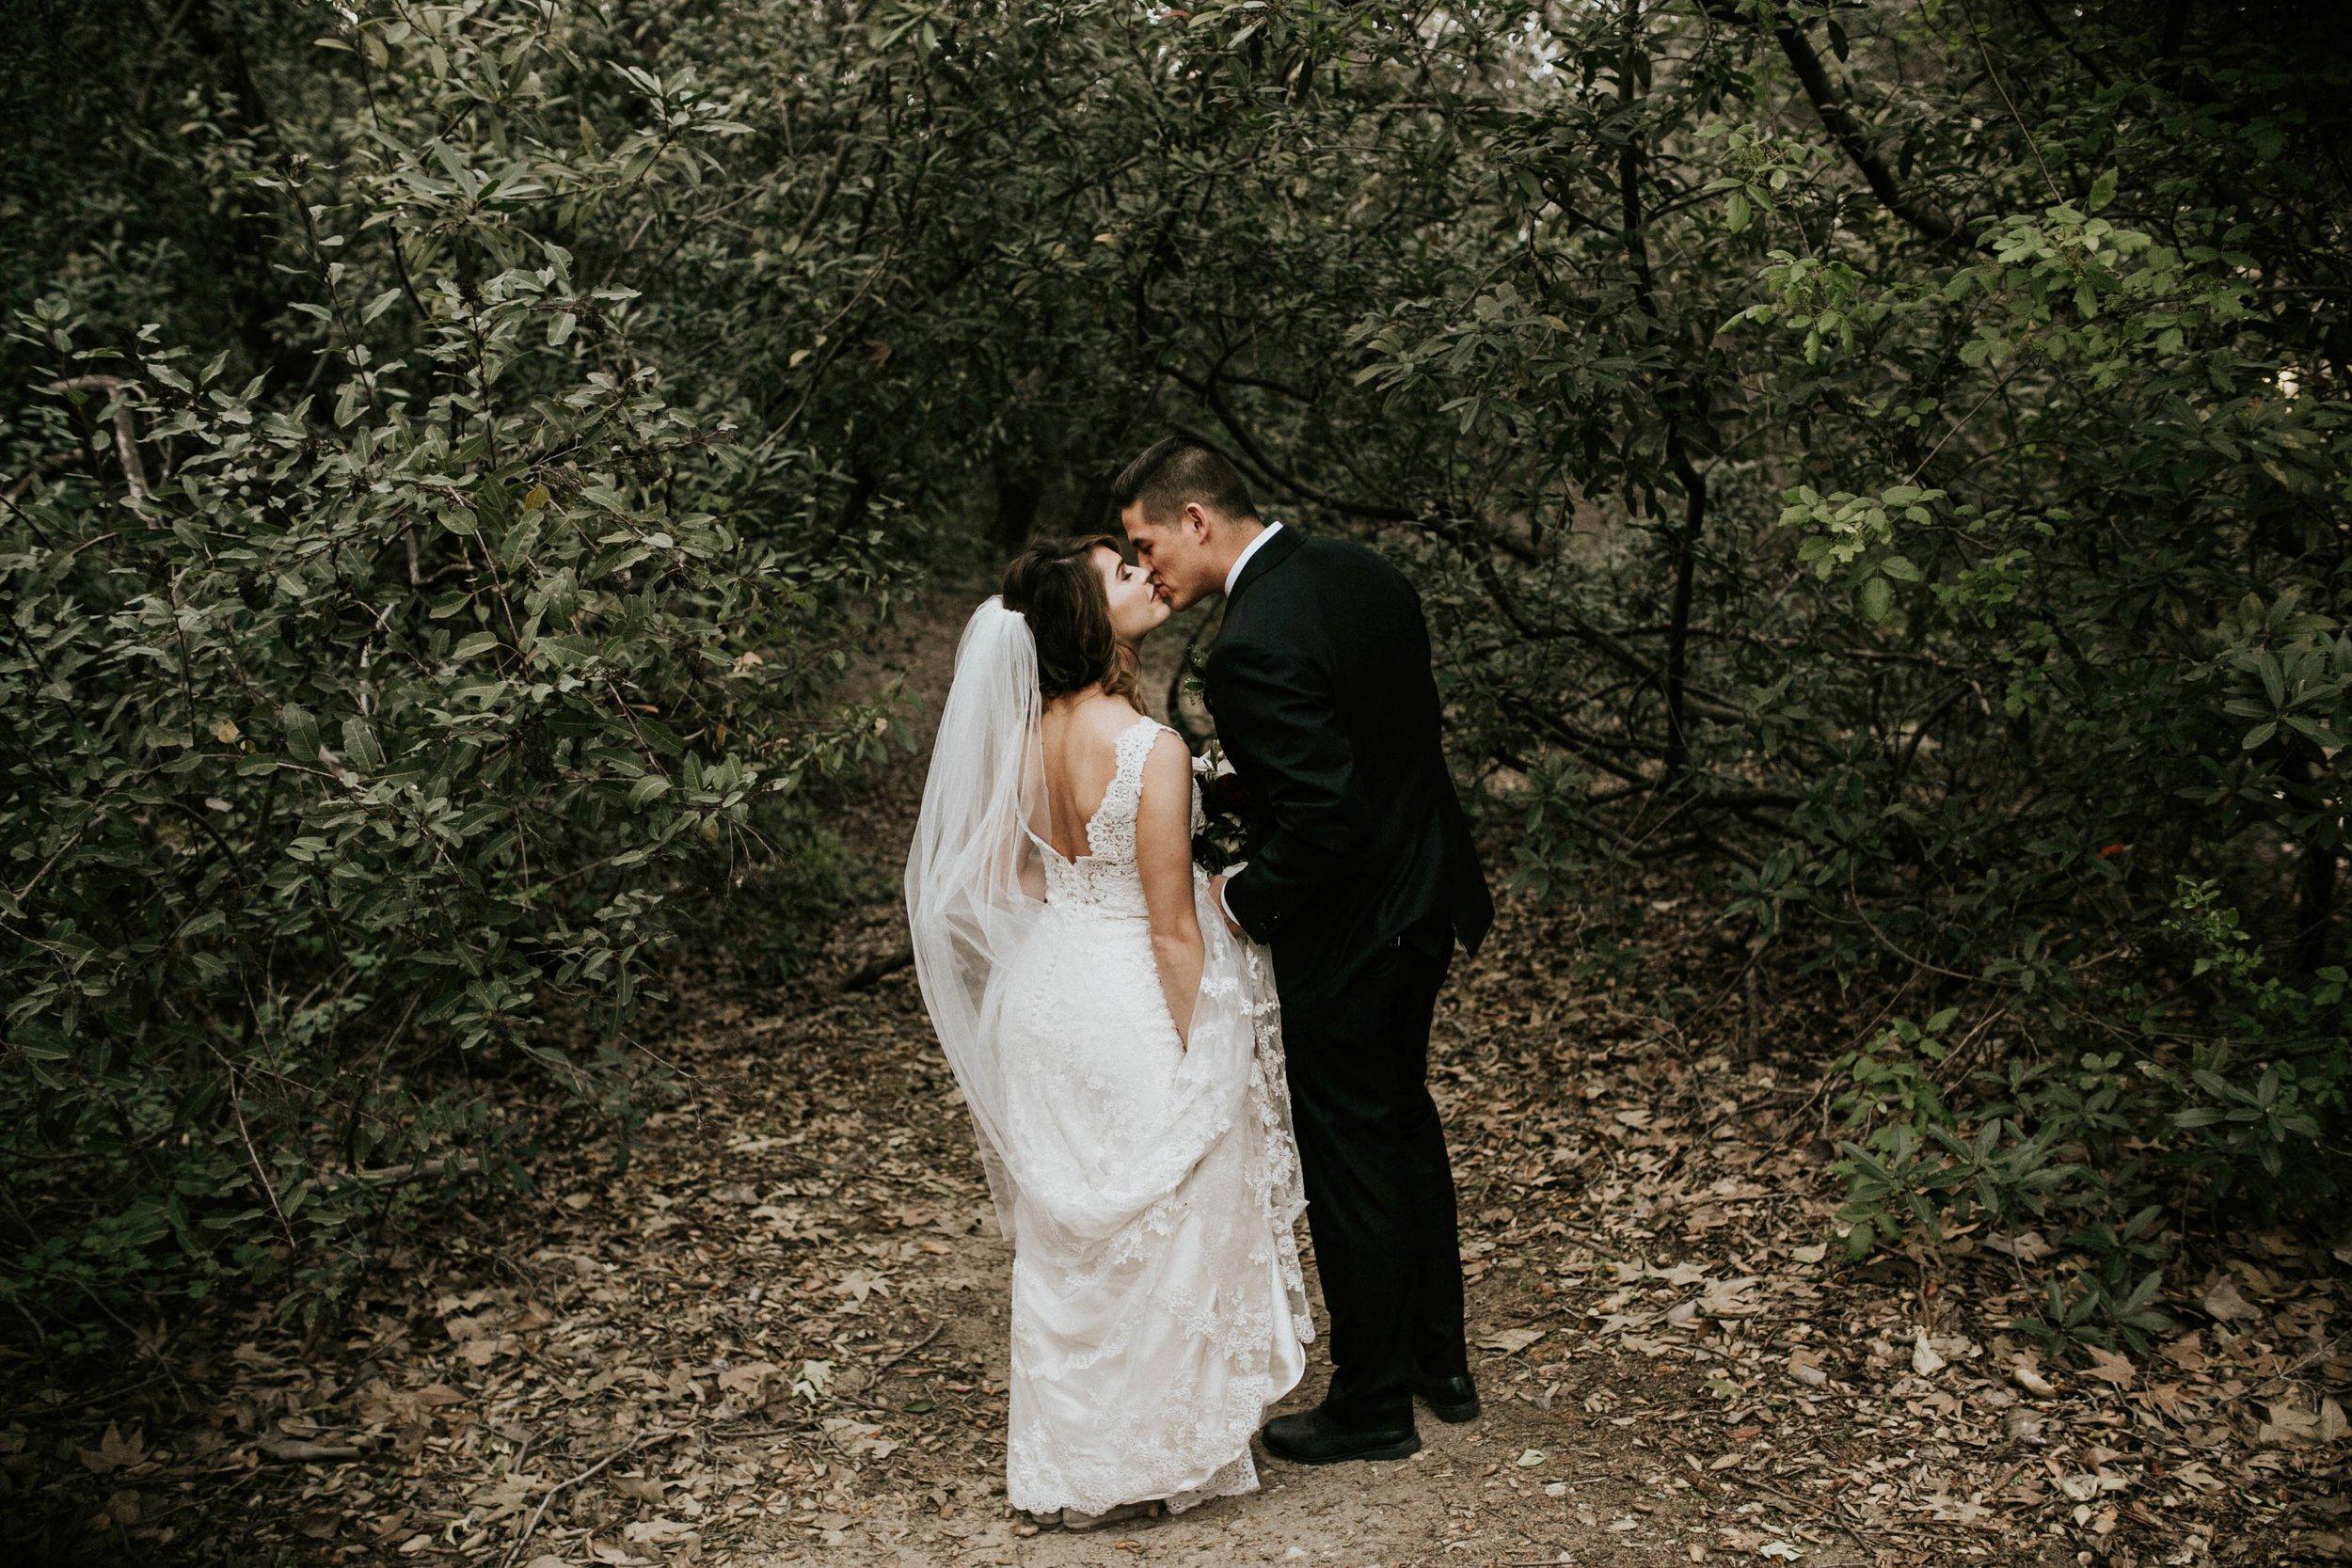 devynbenmarried-slideshow-087.JPG